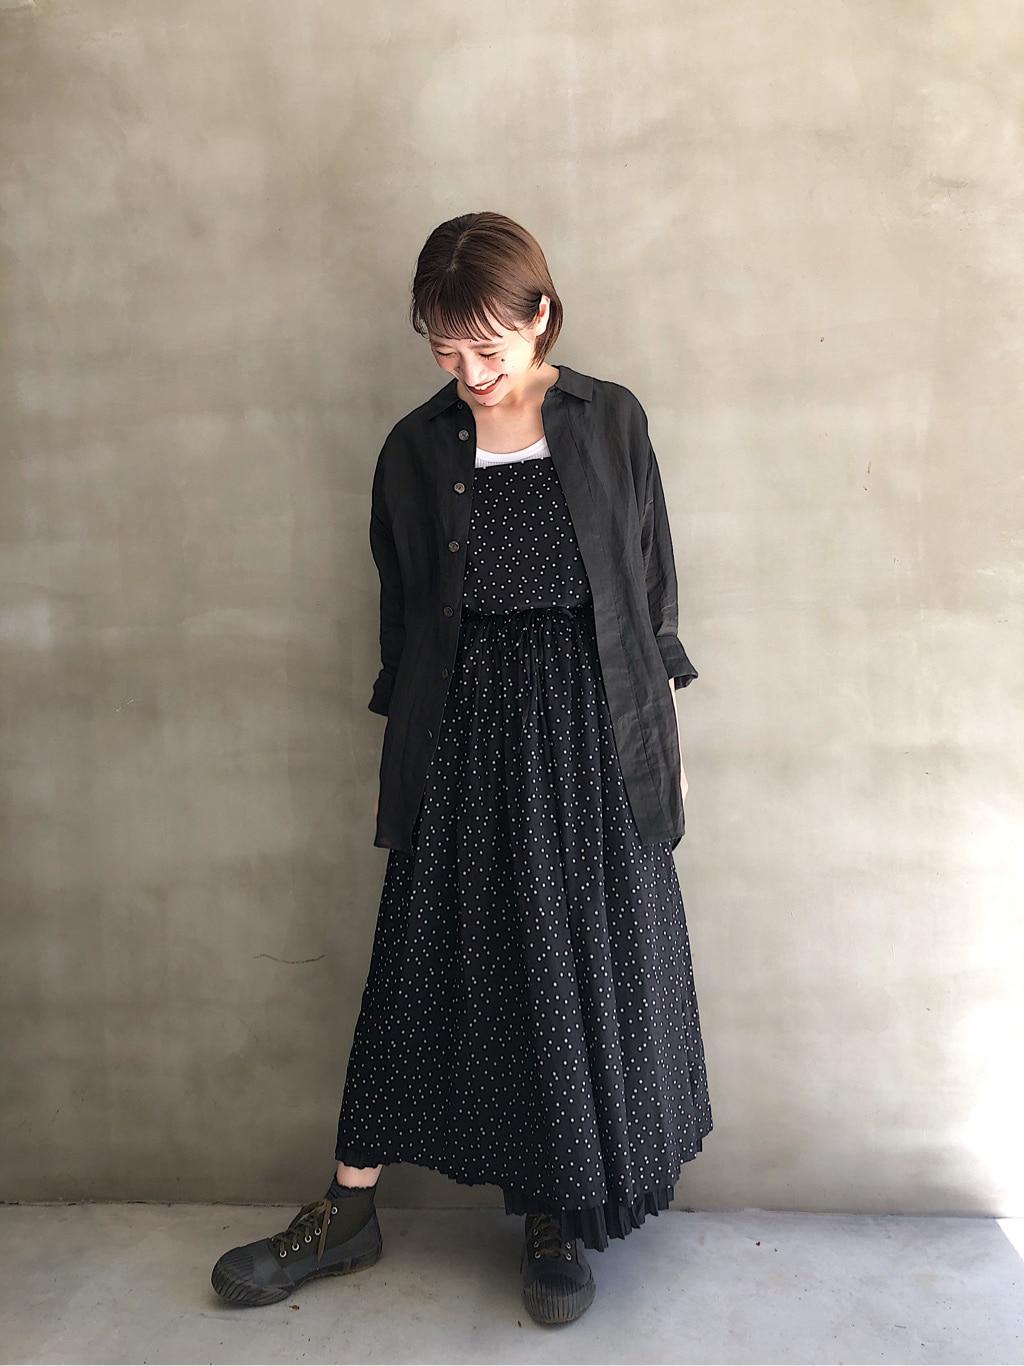 108 yuni / bulle de savon 福岡薬院路面 身長:158cm 2020.08.27